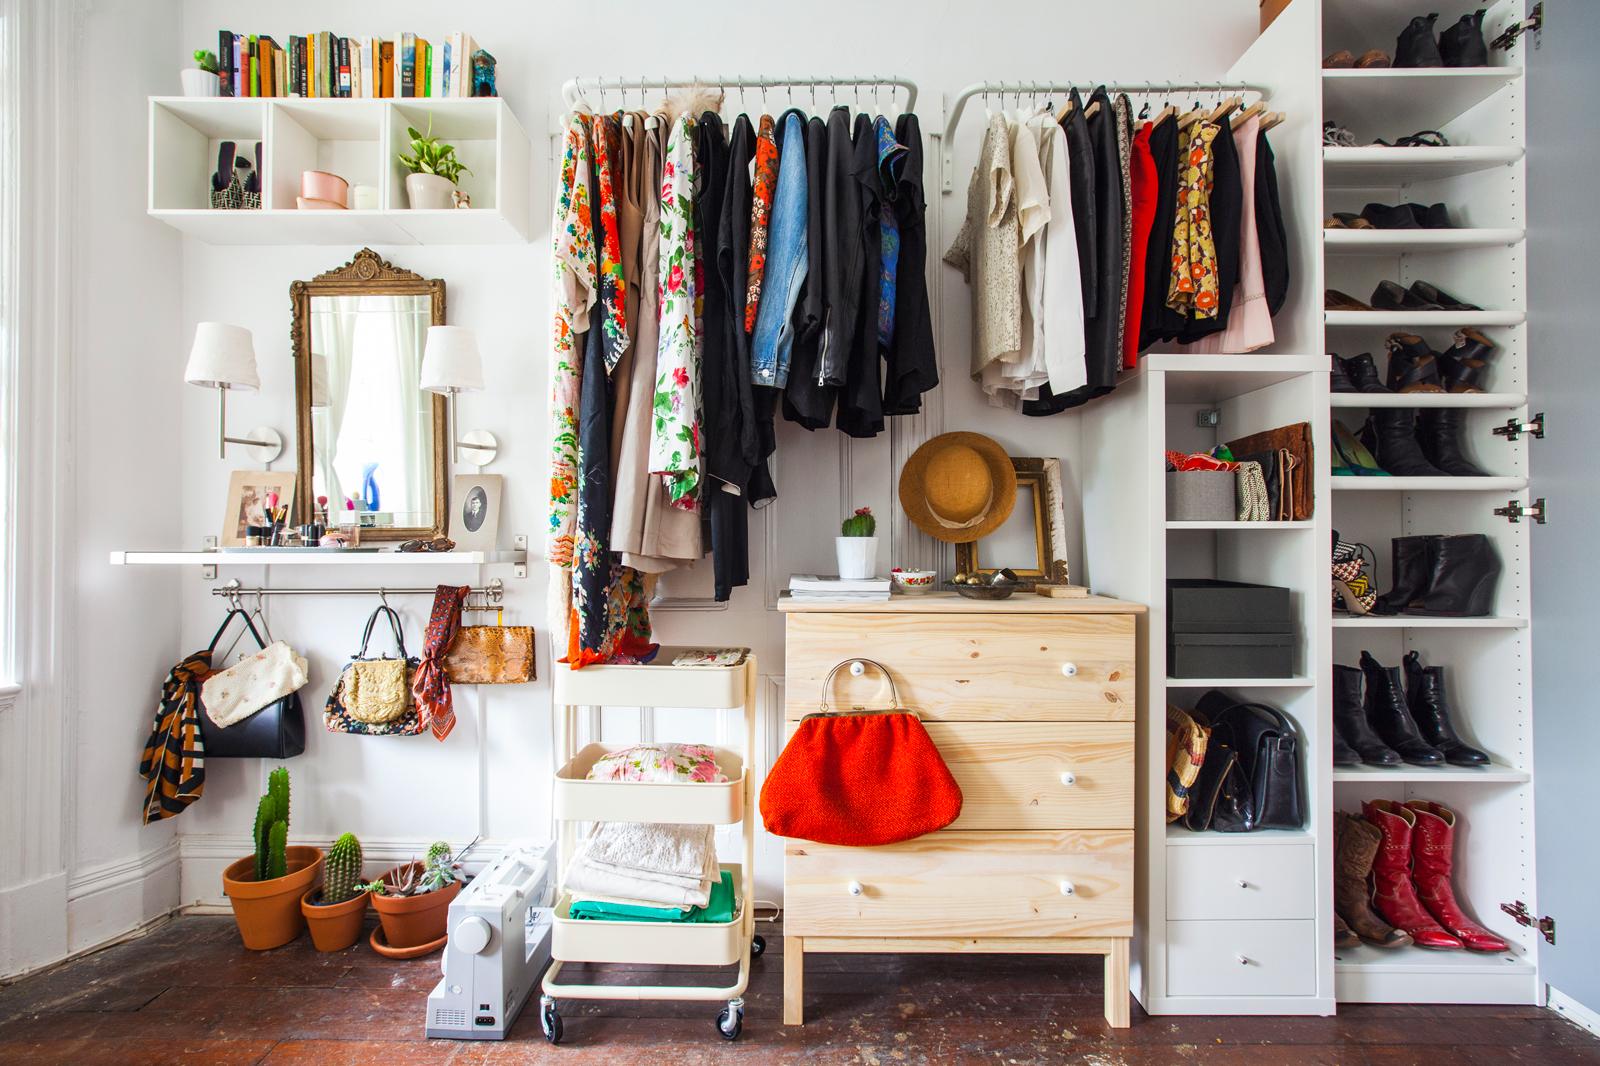 A DIY closet made with IKEA hacks.